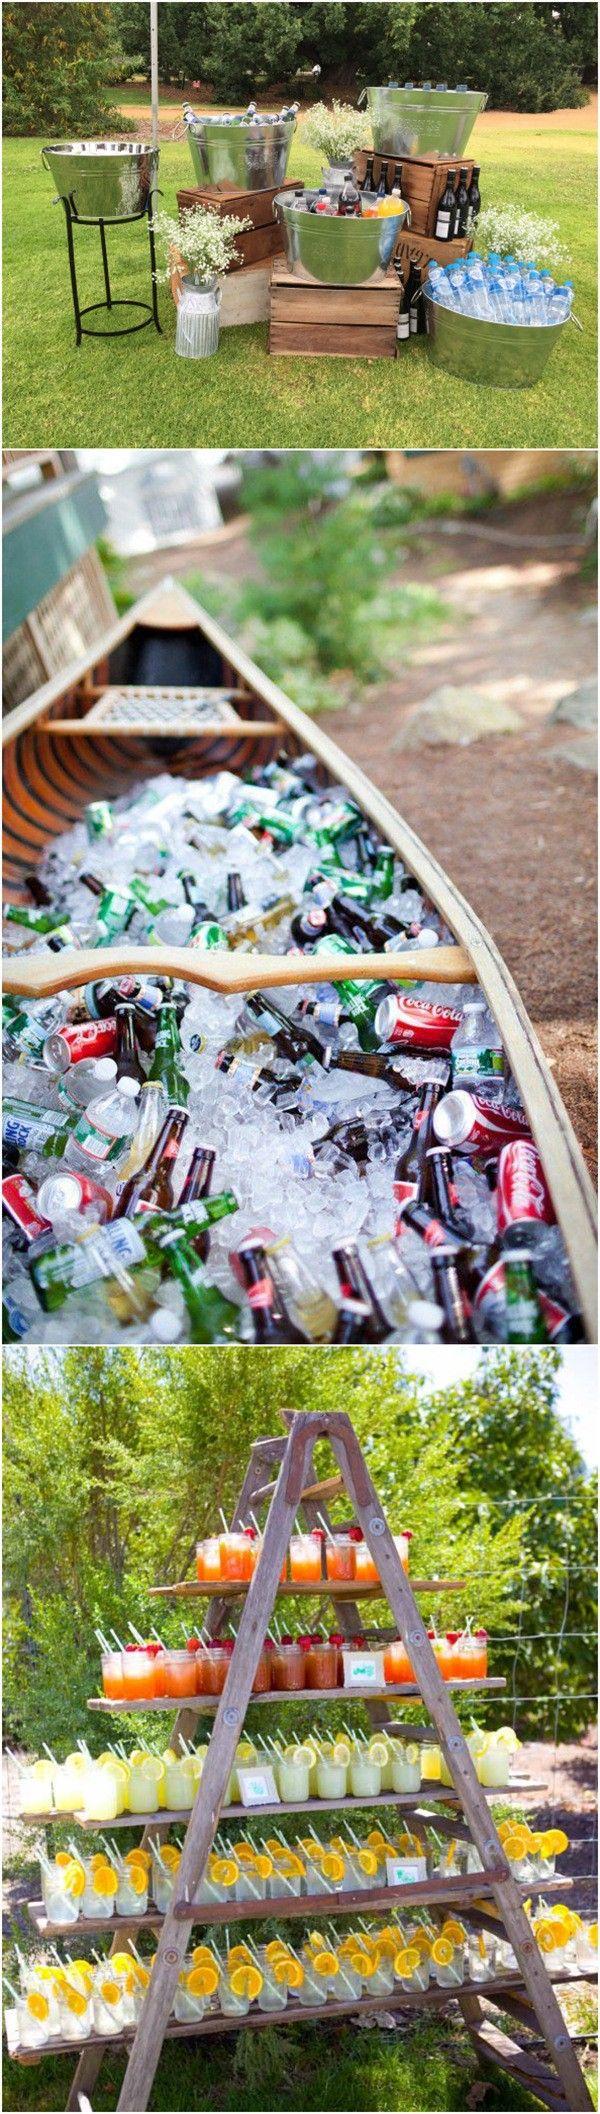 diy drink station for outdoor rustic wedding ideas